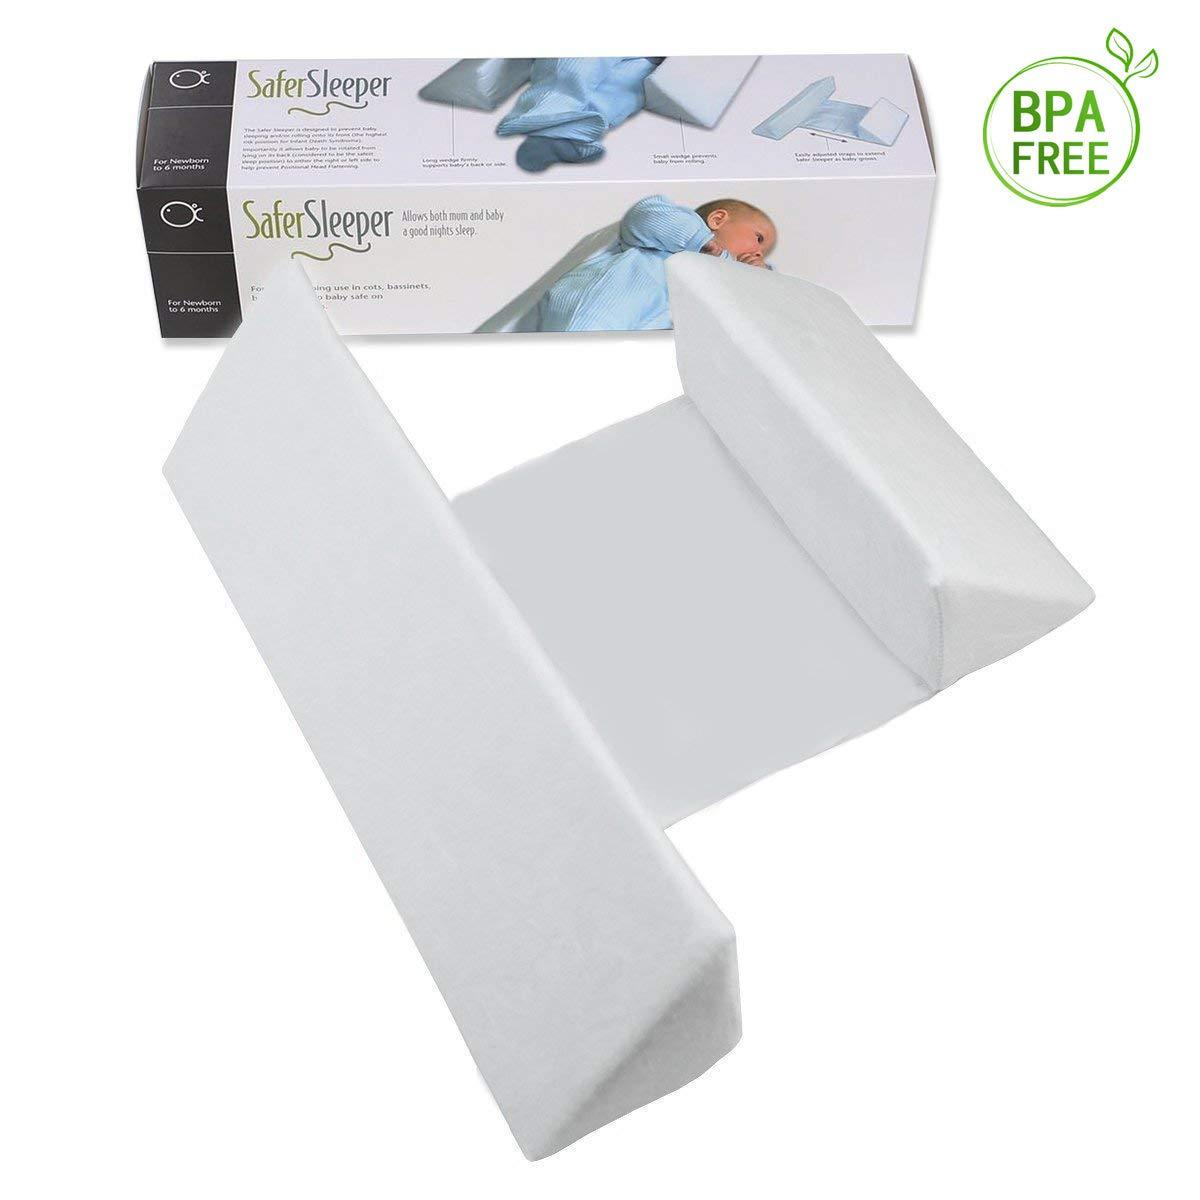 LANREN Newborns Infant Baby Sleep Pillow, Comfortable & Washable (White) Lansen-US